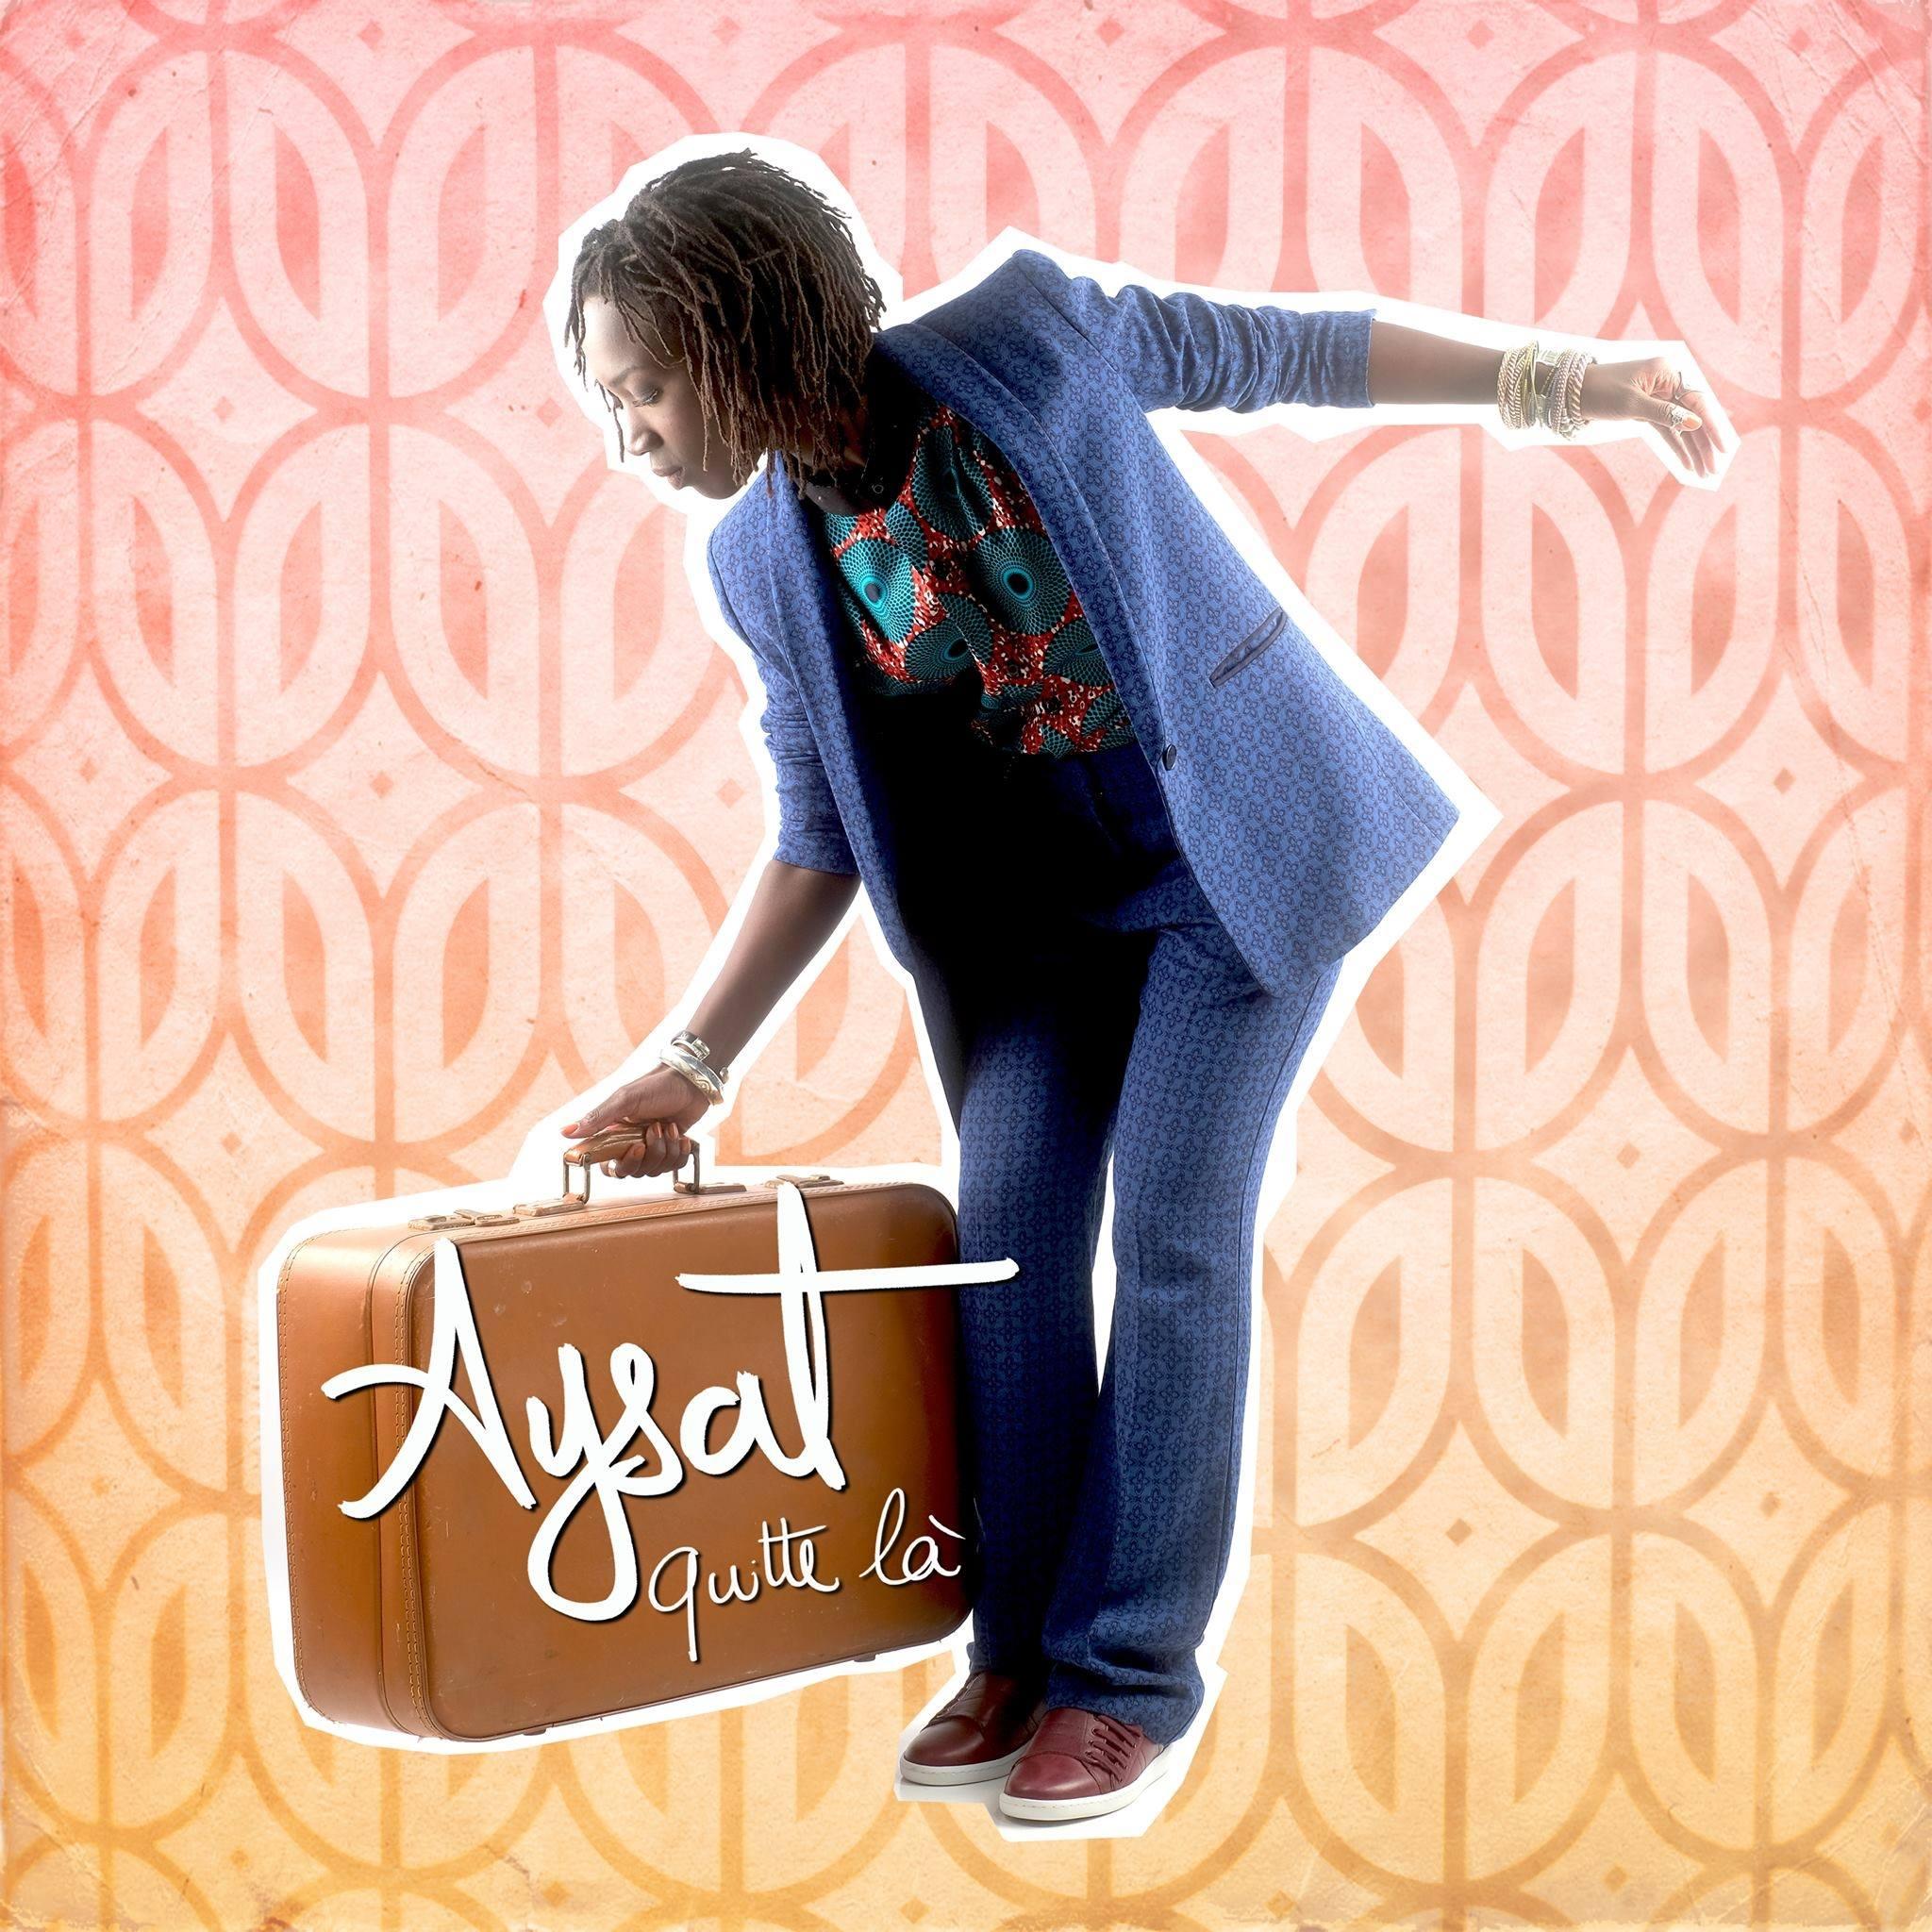 Aysat JustMusic.fr